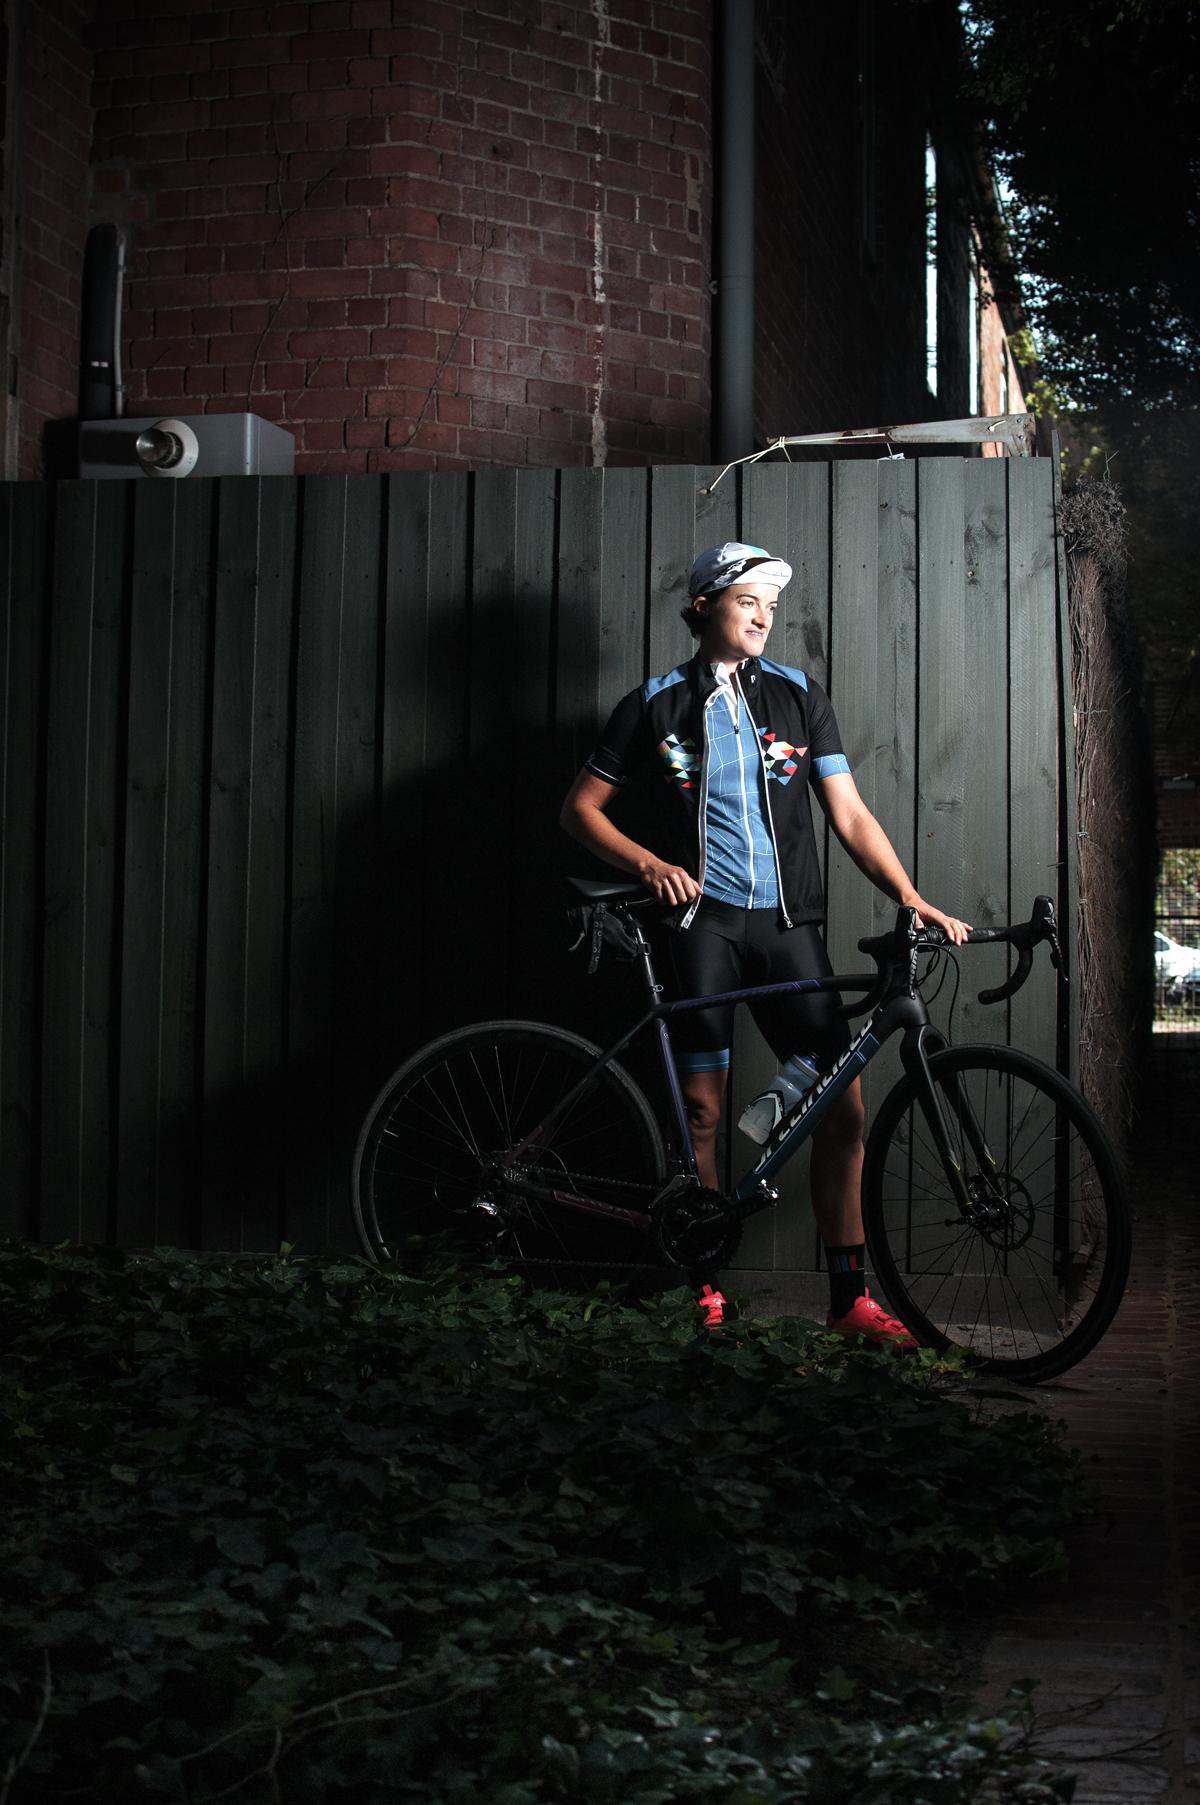 "#36 - NATALIE HOWARD   BIKE: ""HER BIT ON THE SIDE"" SPECIALIZED CX BIKE"